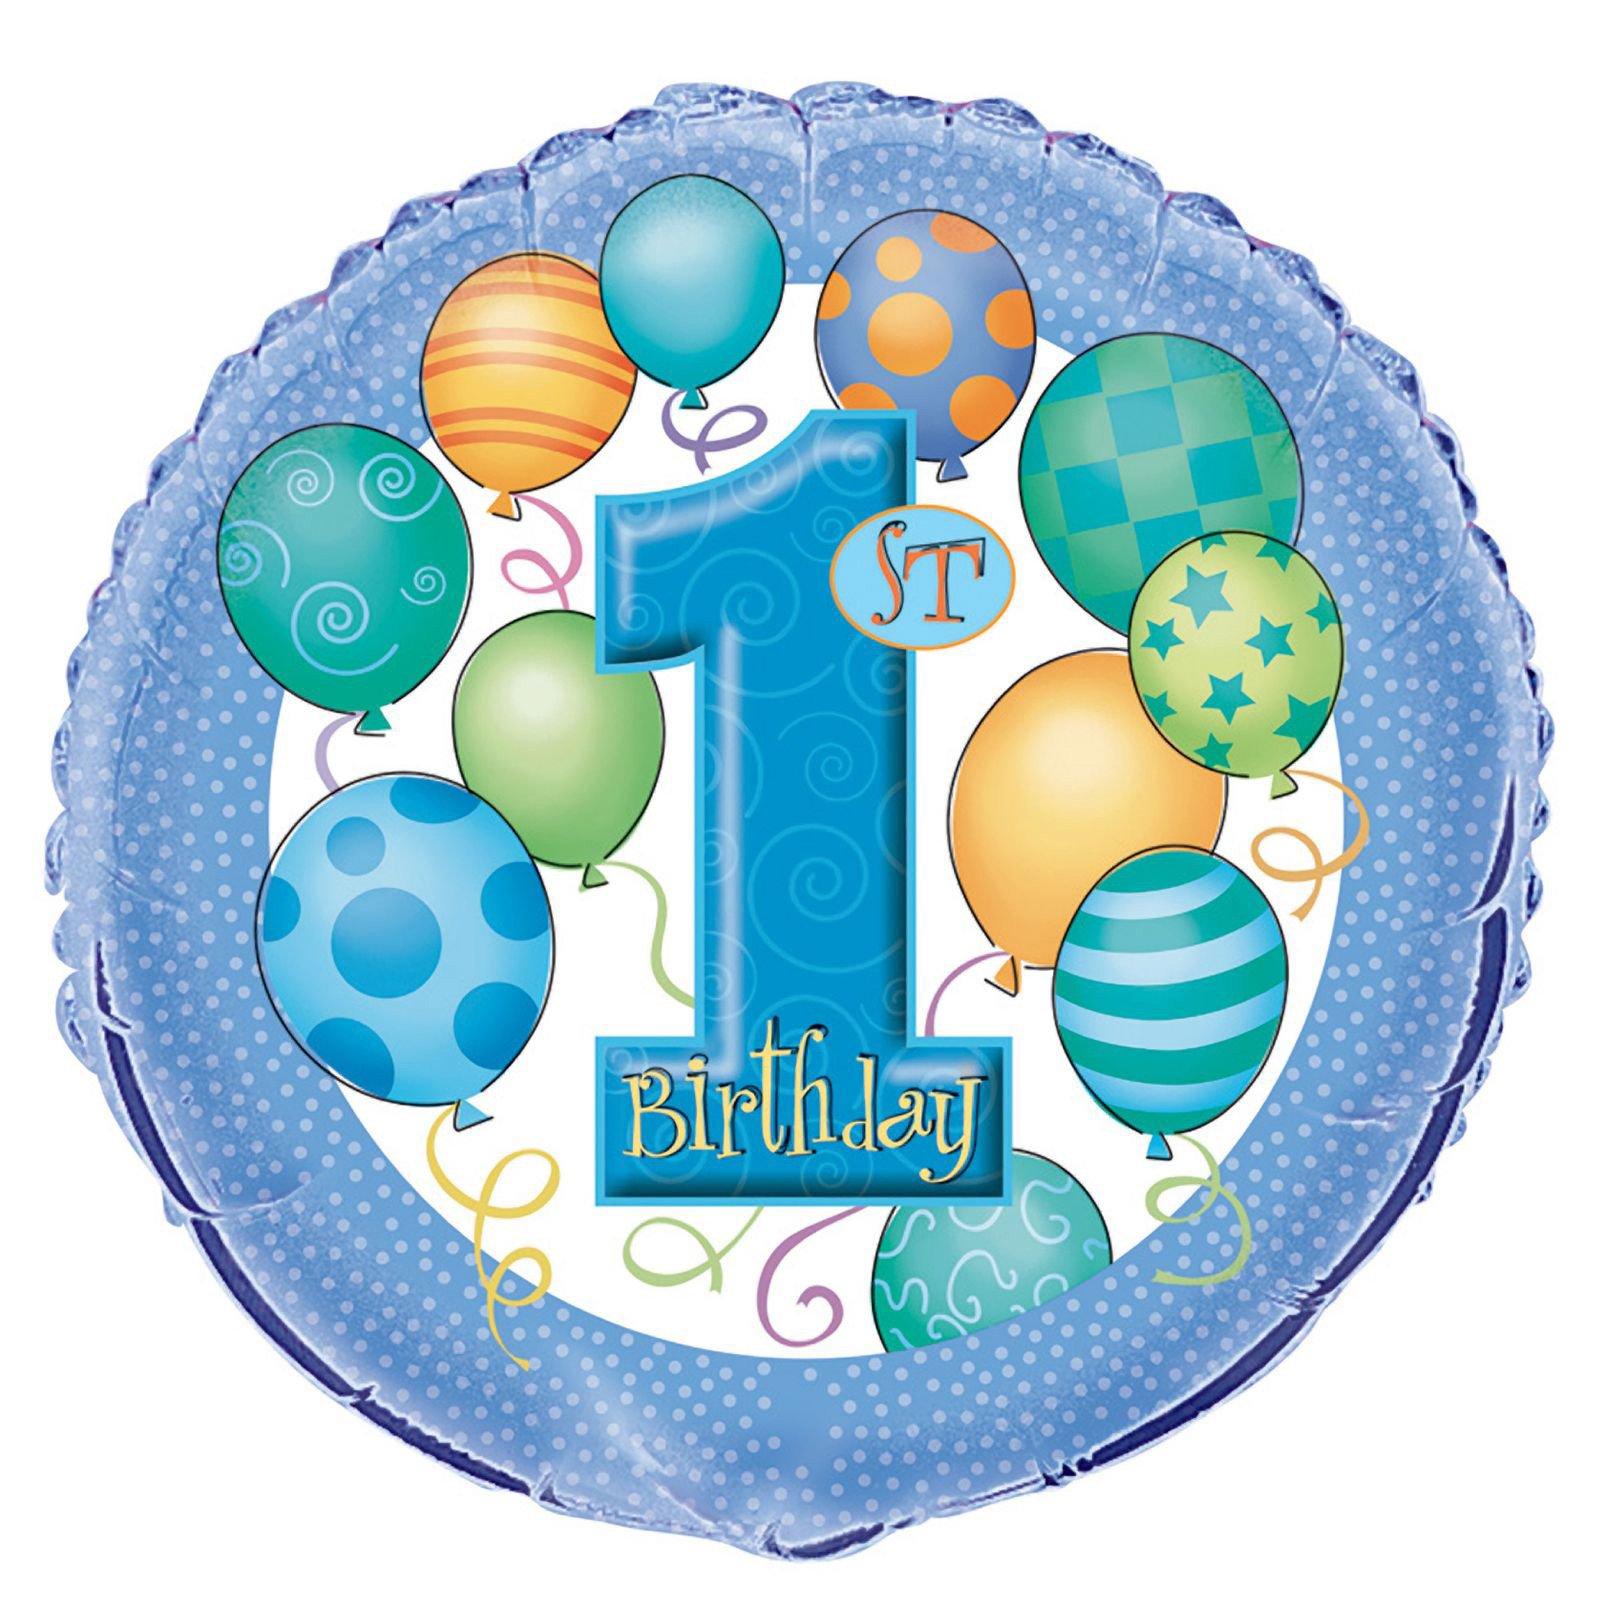 Boy 1st birthday clipart clip 1st Birthday Clipart - Clipart Kid clip